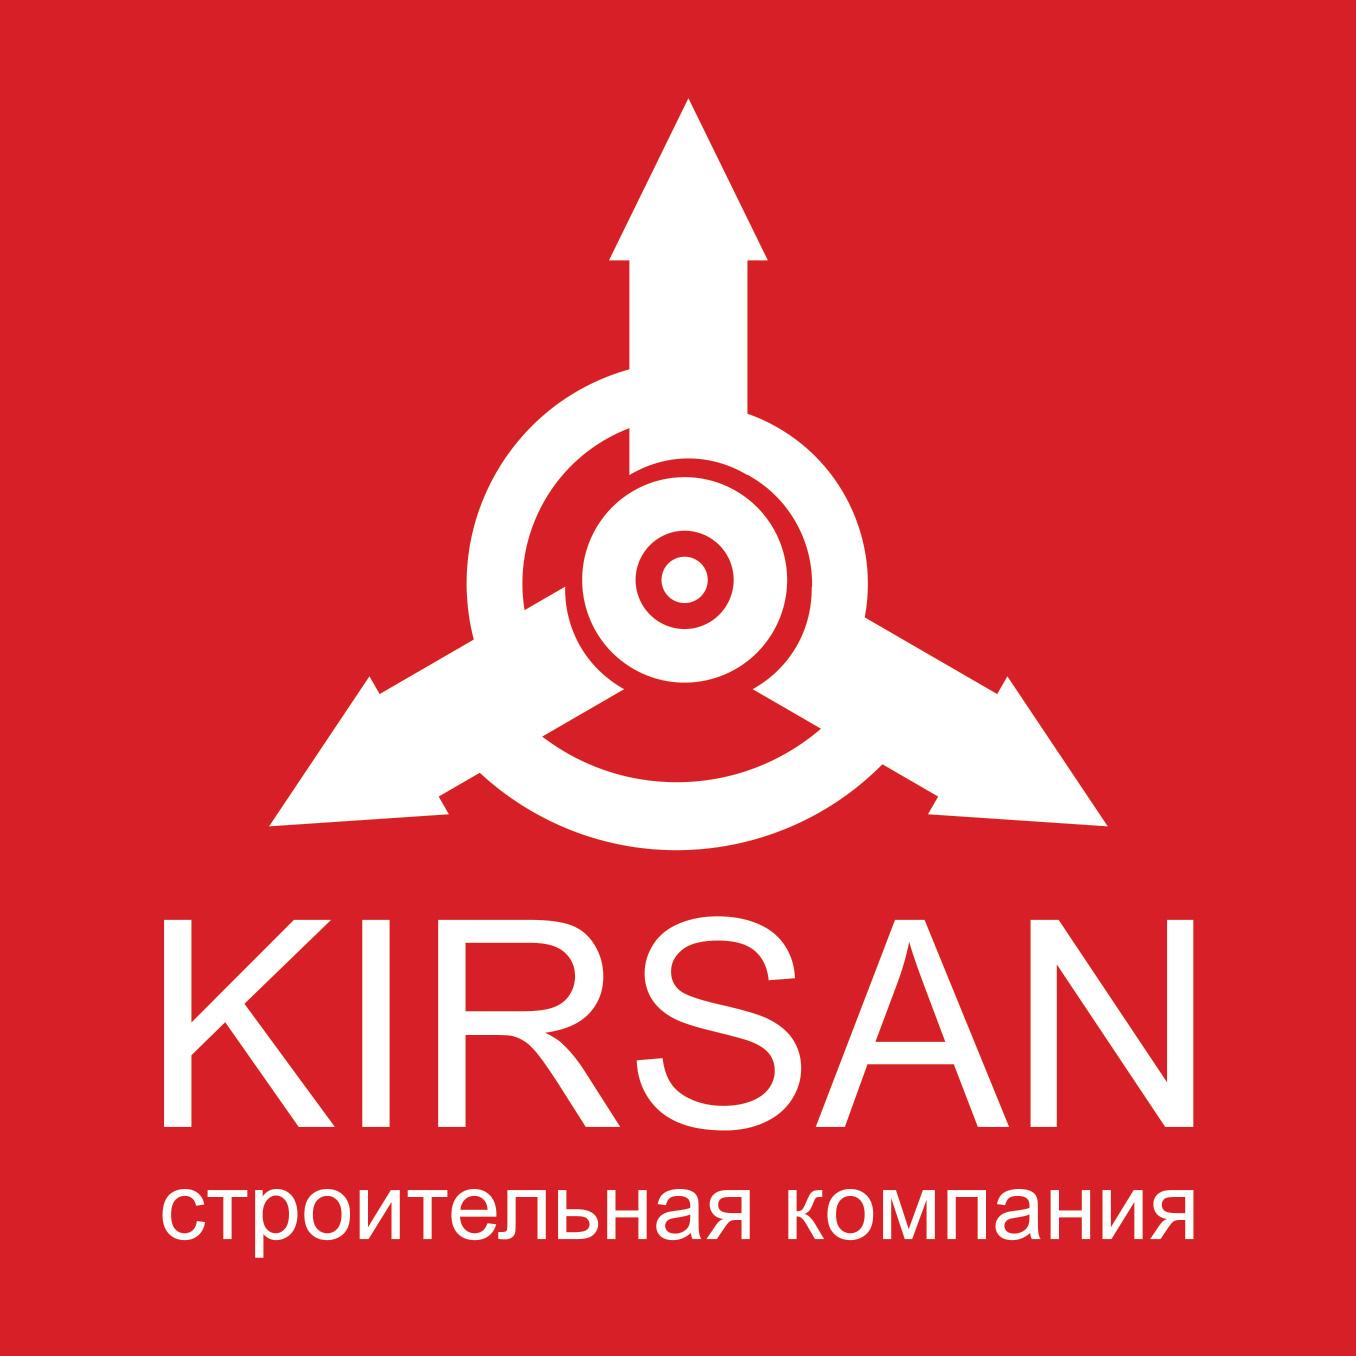 KIRSAN COM SRL